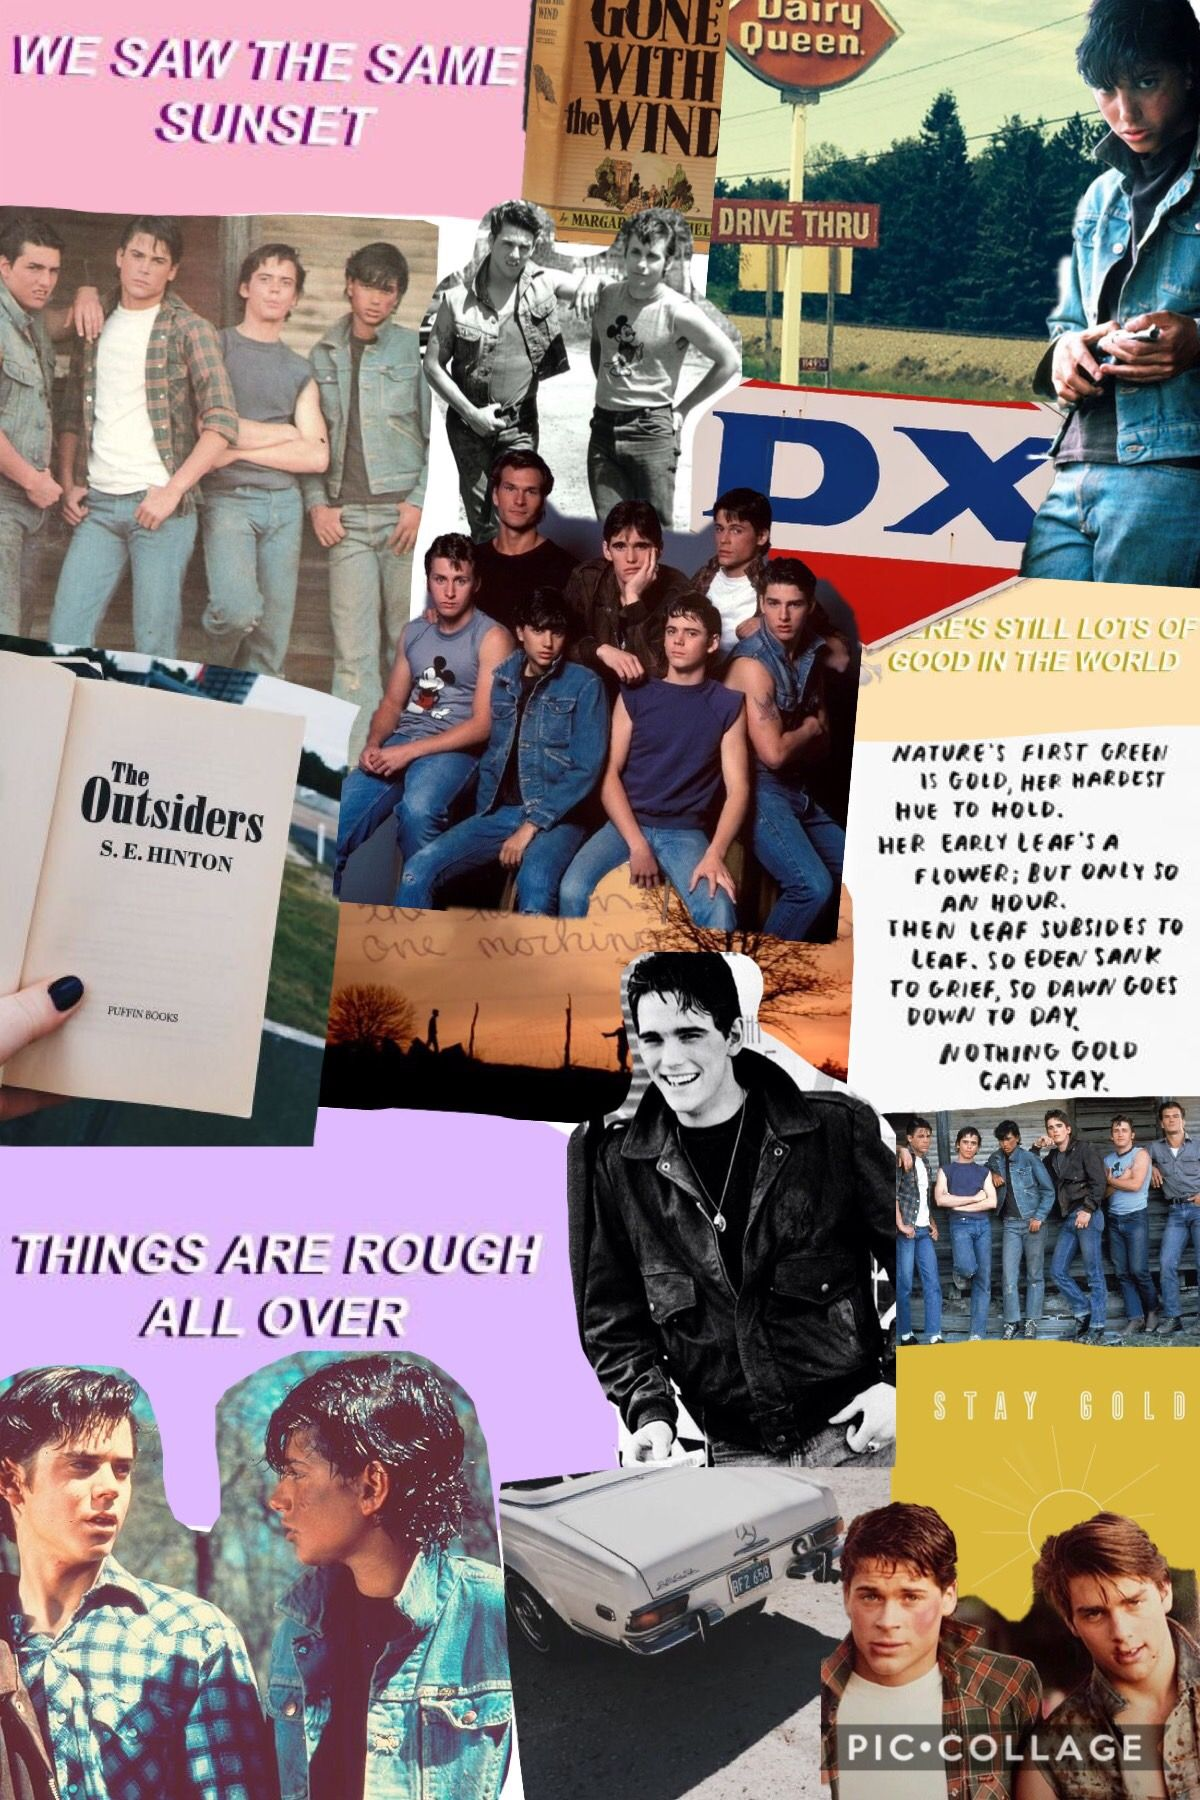 The Outsiders In 2019 The Outsiders The Outsiders 1983